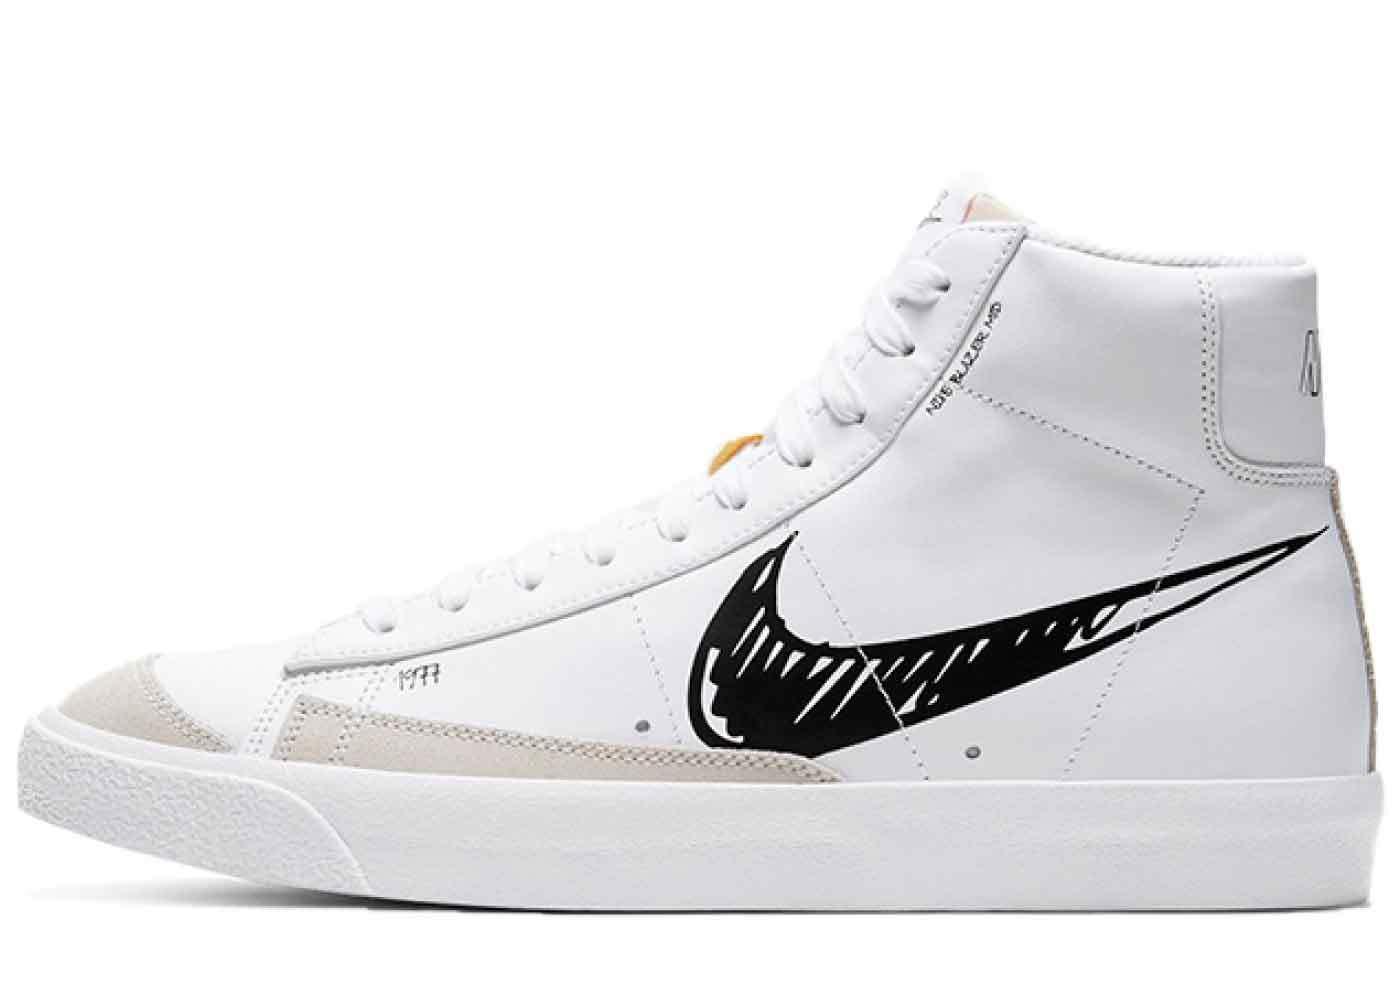 Nike Blazer Mid Vintage '77 Sketch Pack White/Blackの写真